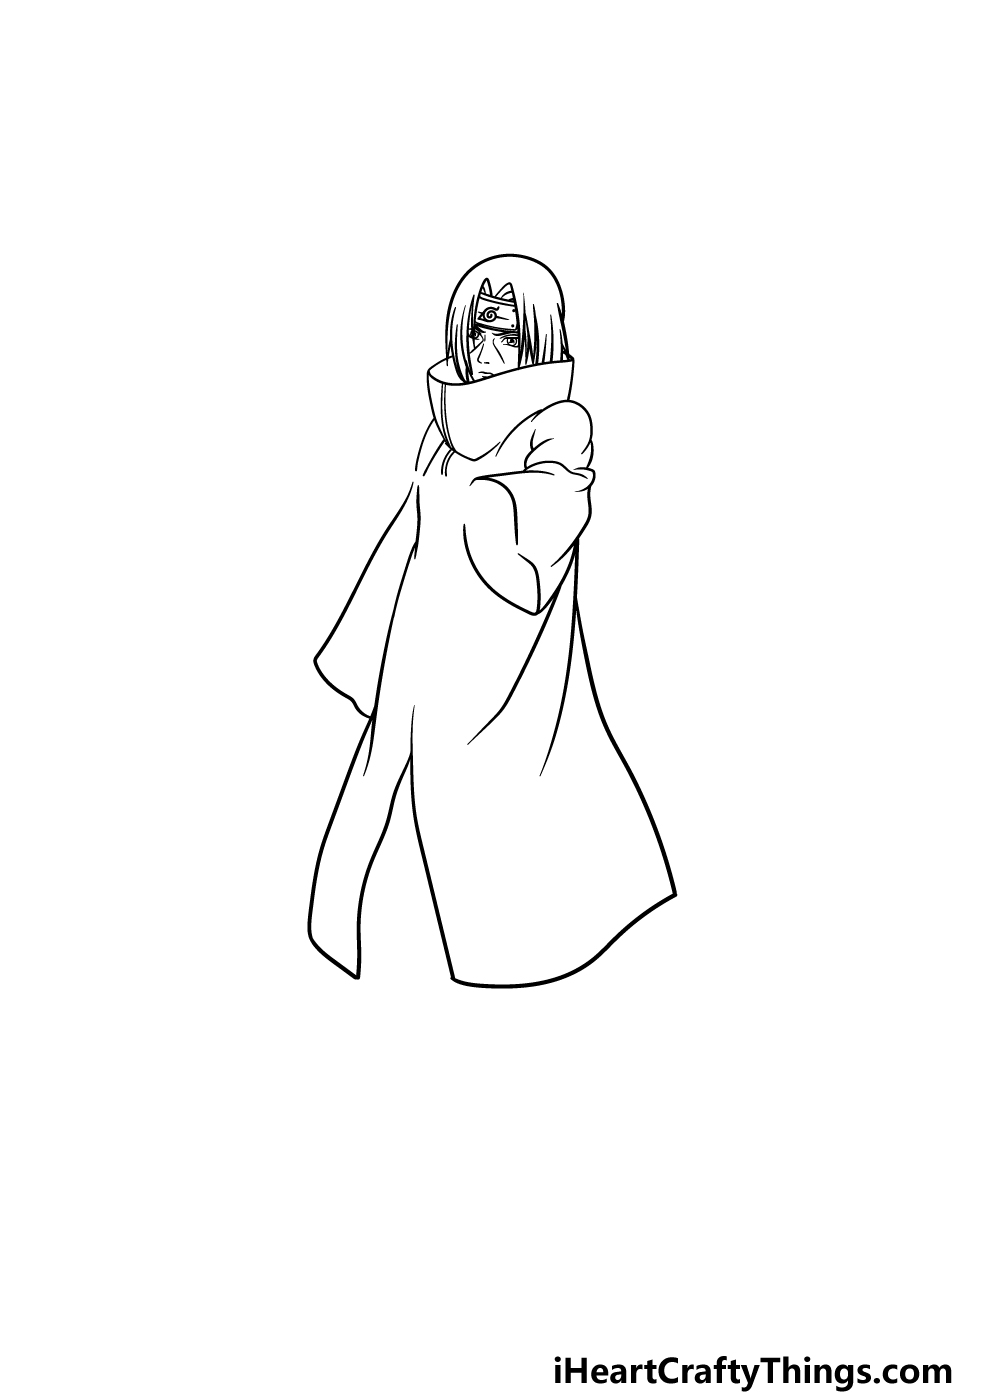 drawing Itachi step 3